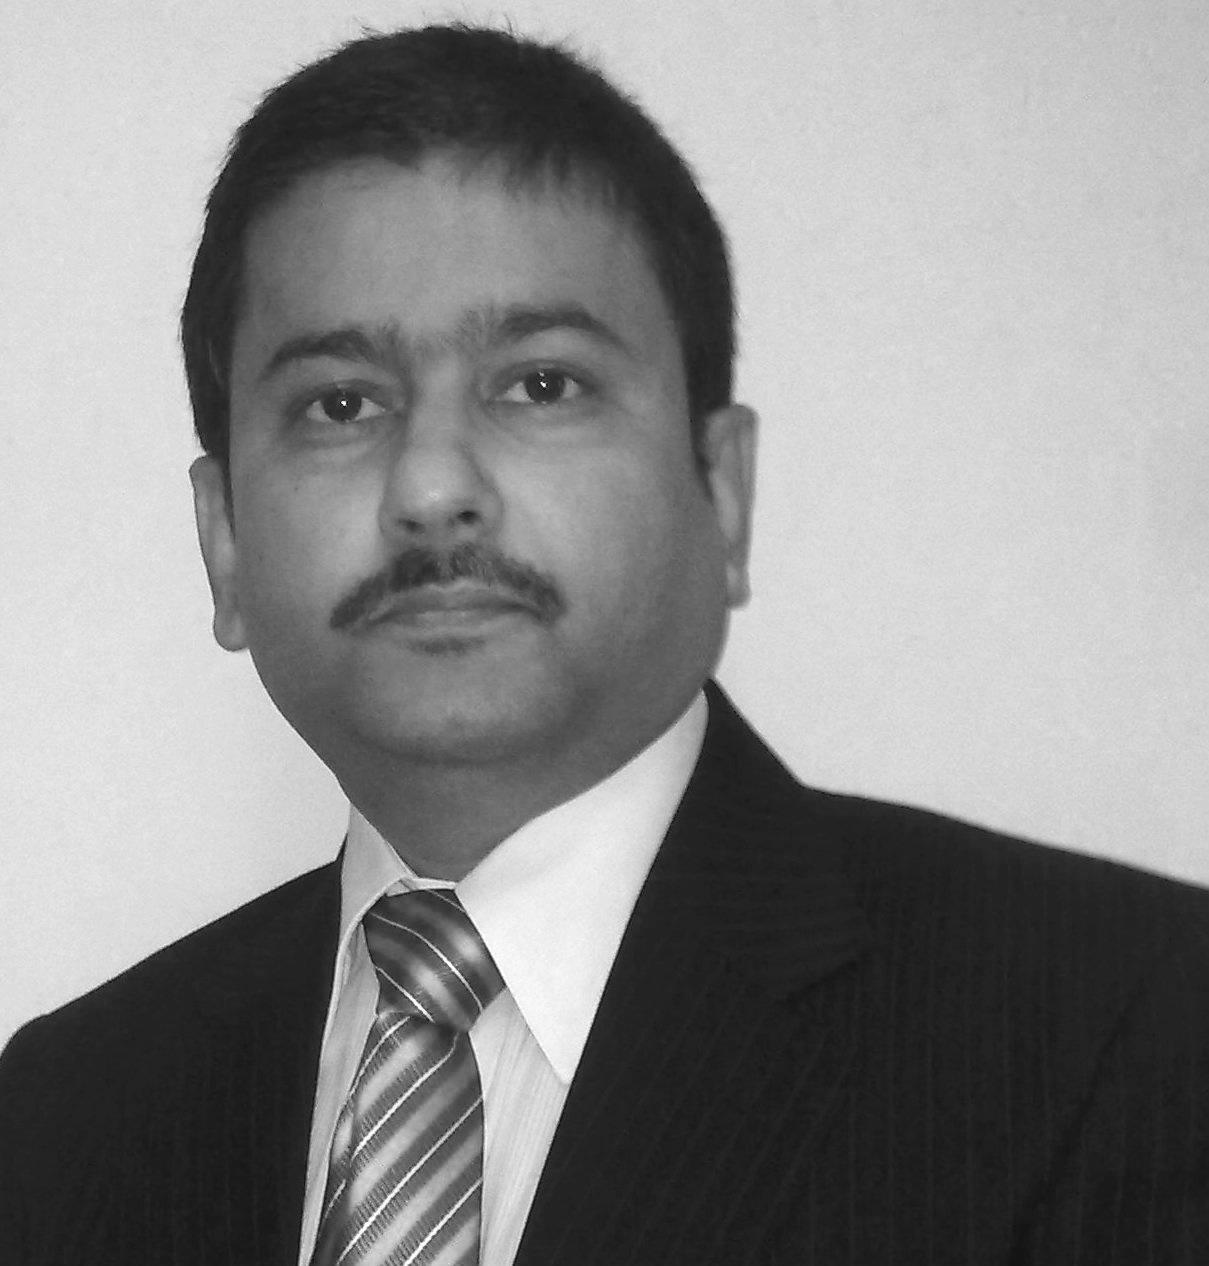 Syed Khushtar Hasan, Marketing Manager, Saudi White Cement Company